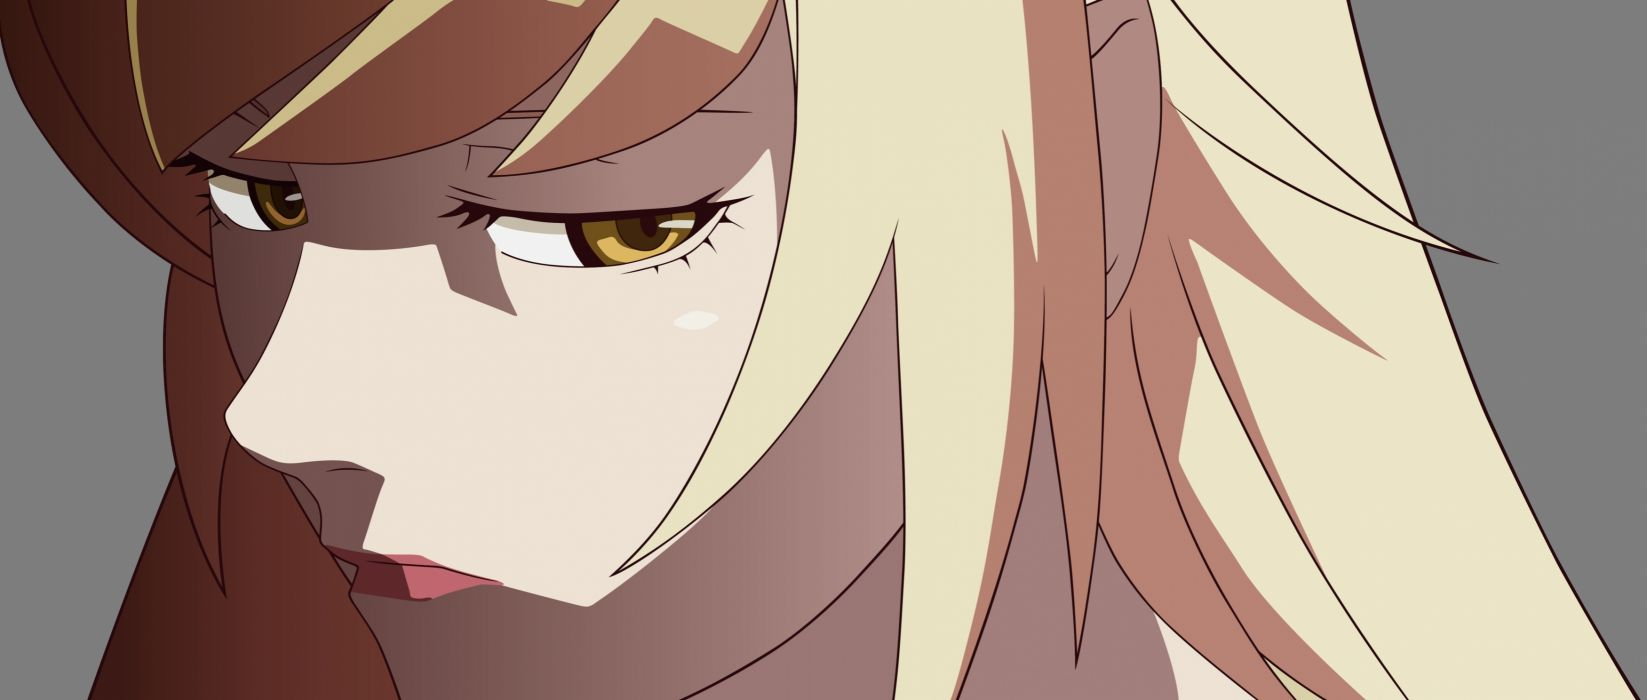 Konachan com - 246964 blonde hair close kissshot acerolaorion heartunderblade kizumonogatari monogatari (series) oshino shinobu transparent vector yellow eyes wallpaper